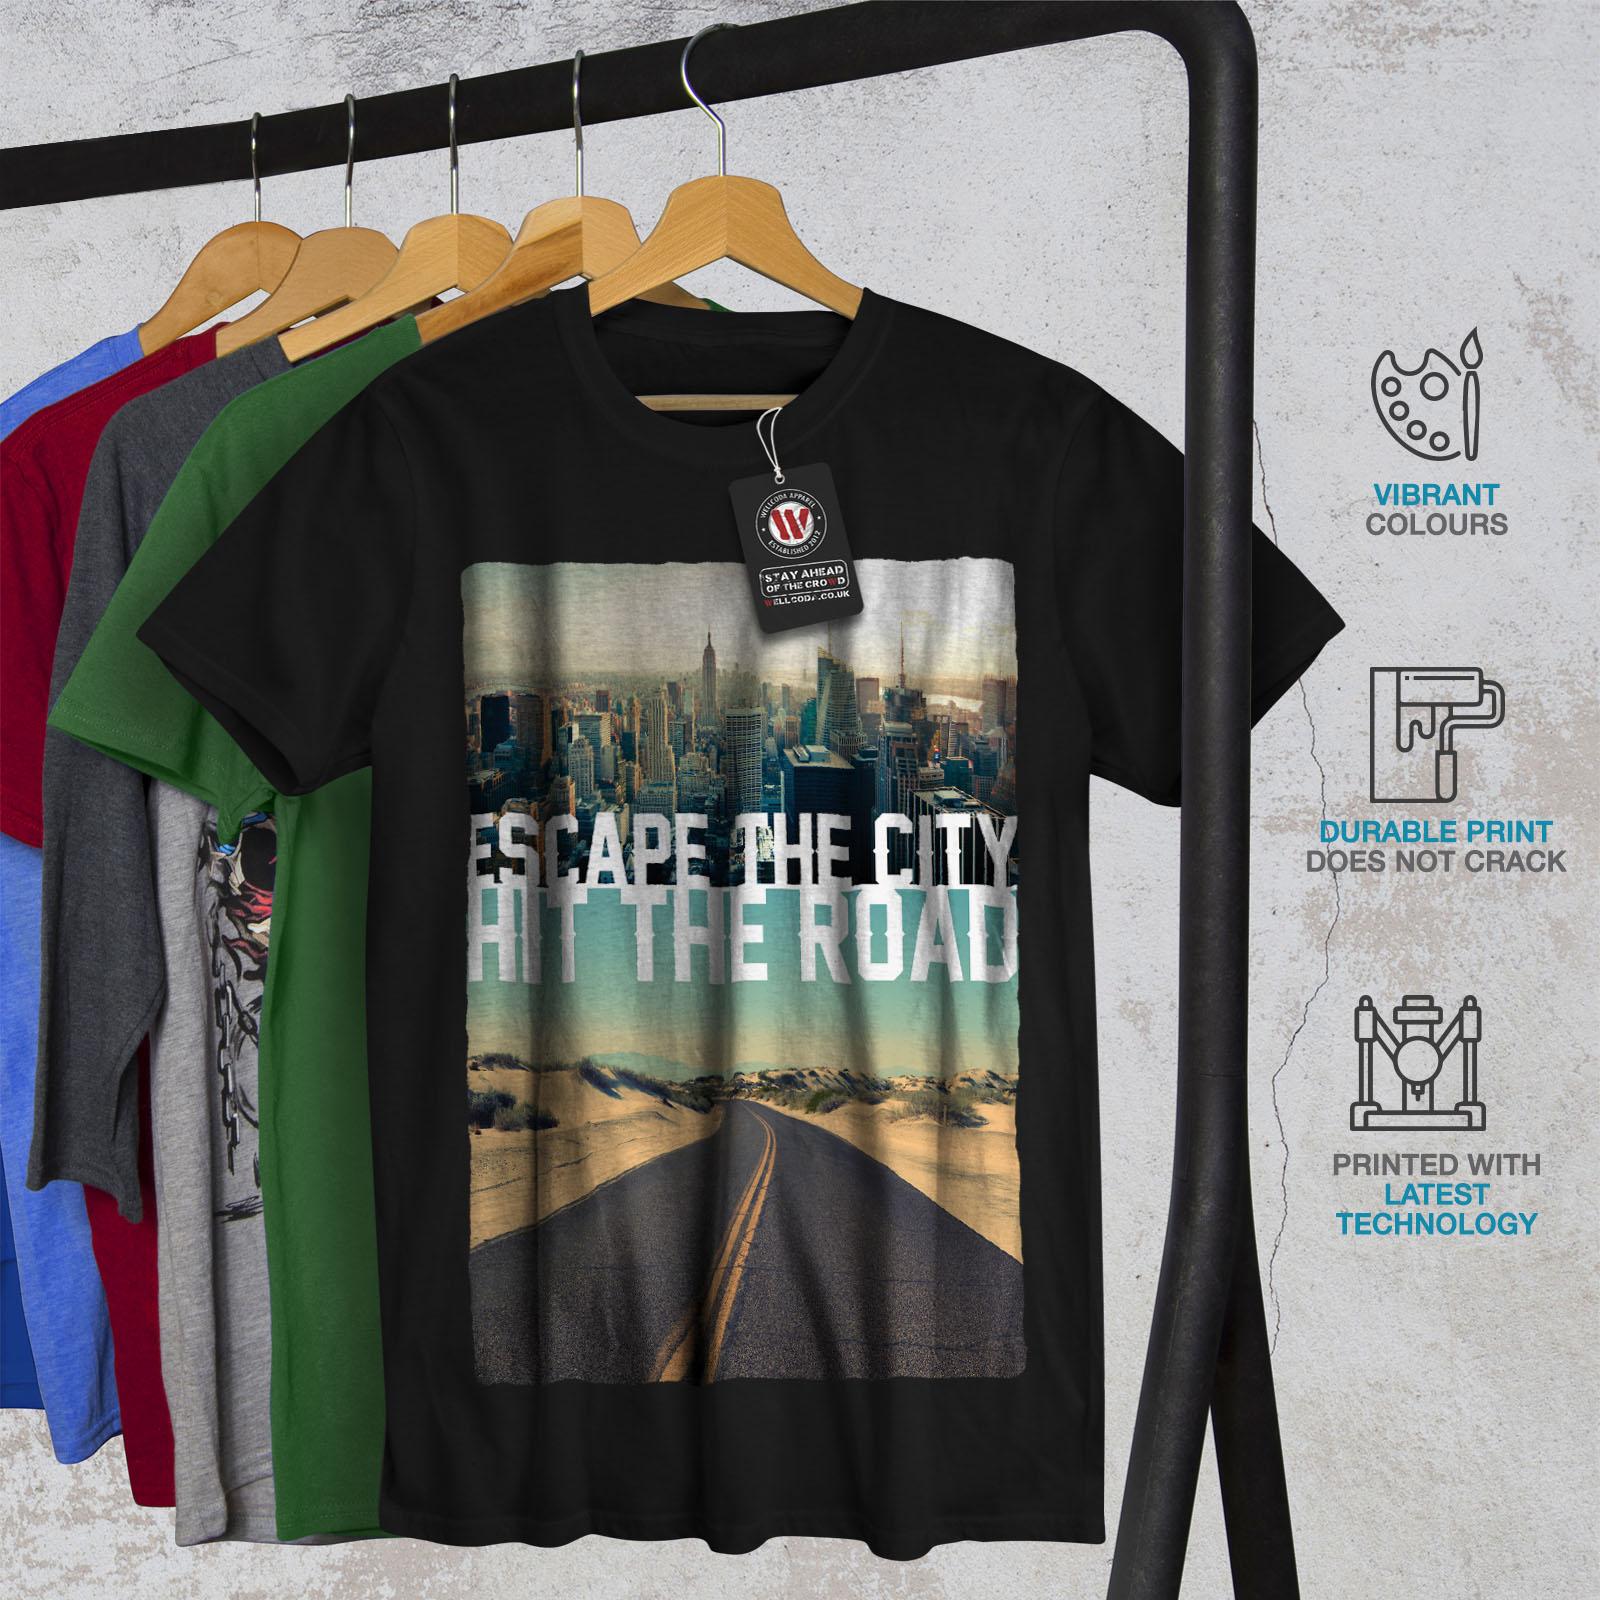 Wellcoda-Escape-The-City-Herren-T-Shirt-Lifestyle-Grafikdesign-Printed-Tee Indexbild 6